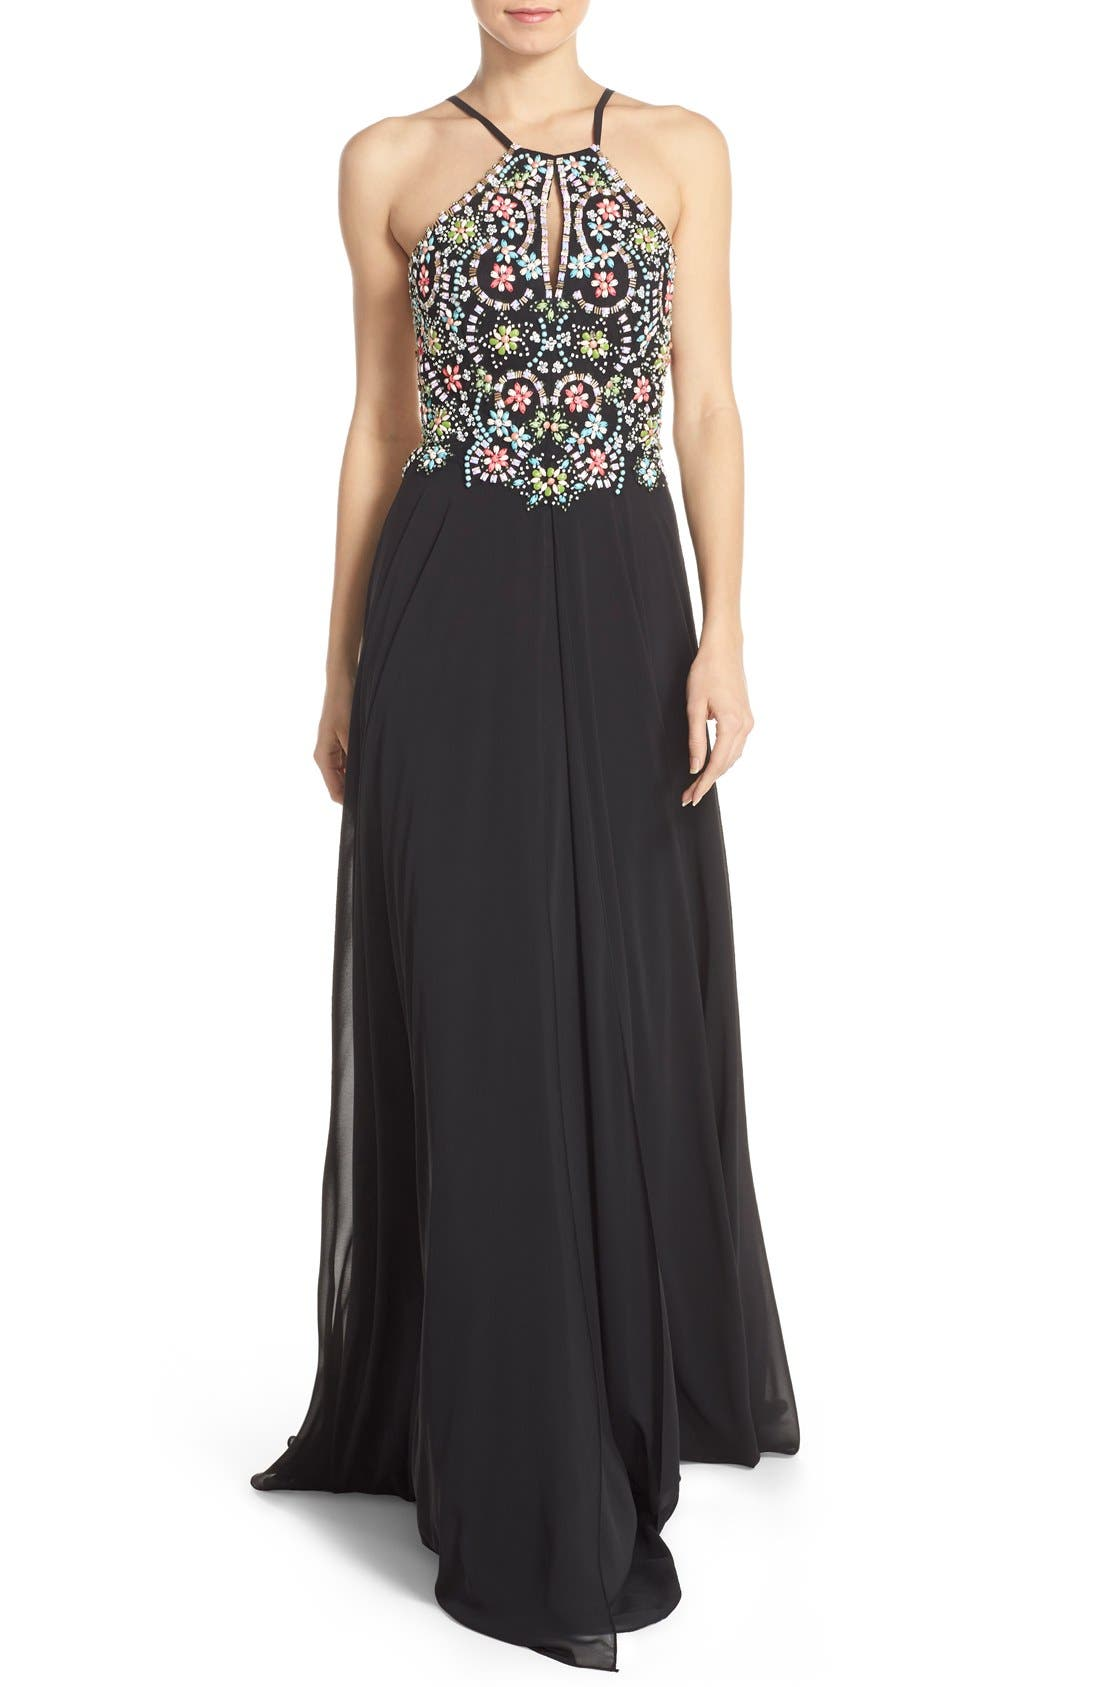 Main Image - Faviana Embellished Chiffon Fit & Flare Gown